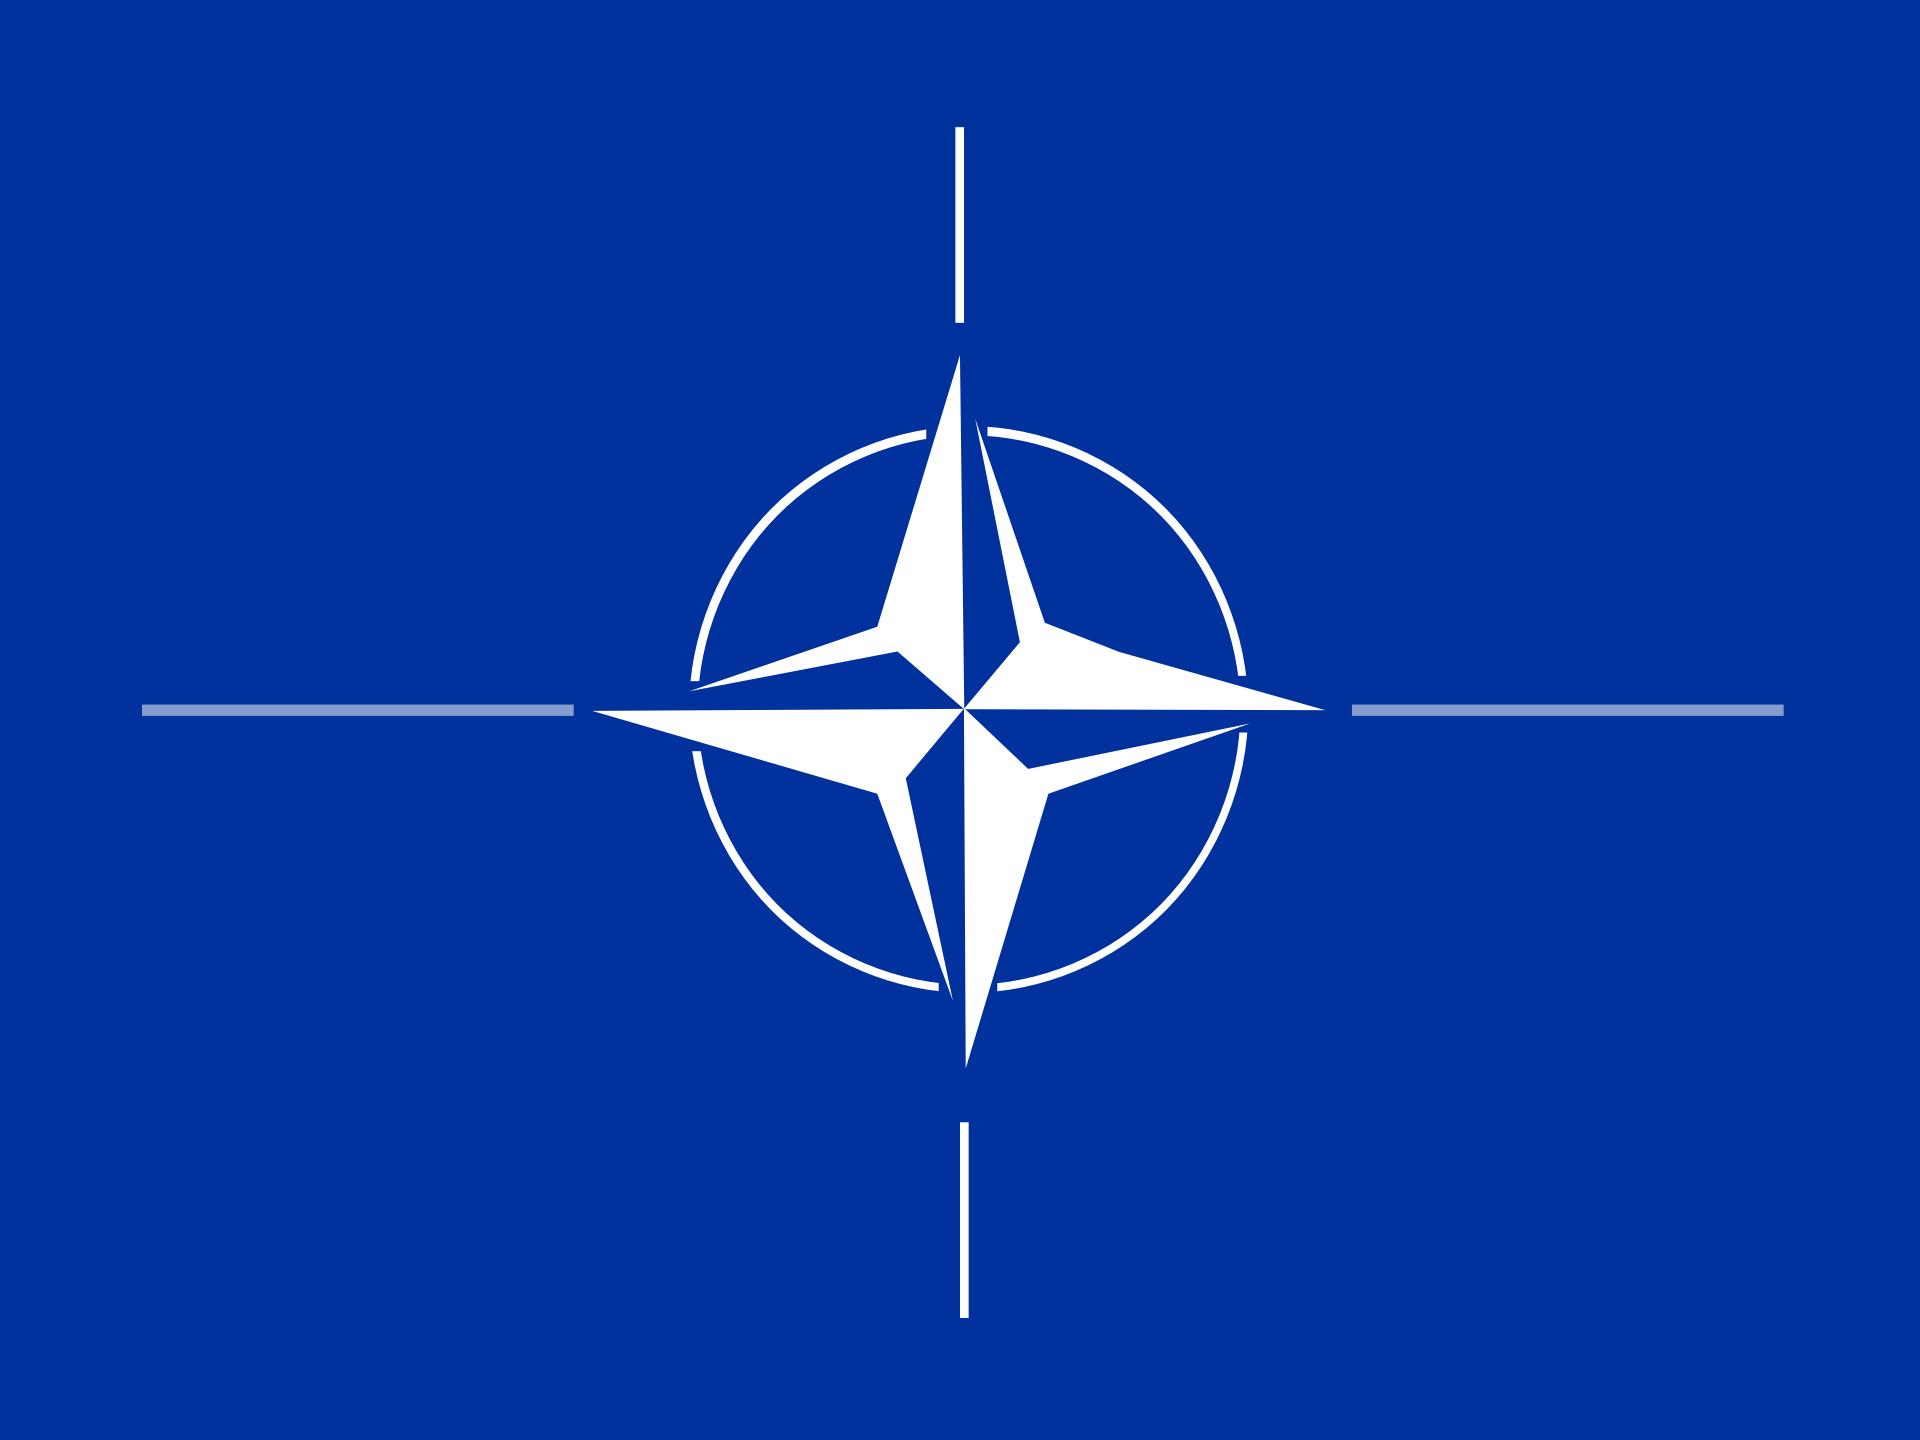 NATO vyznaje pragnennja Ukraїny do povnocinnogo členstva ta nadaje їj status aspiranta